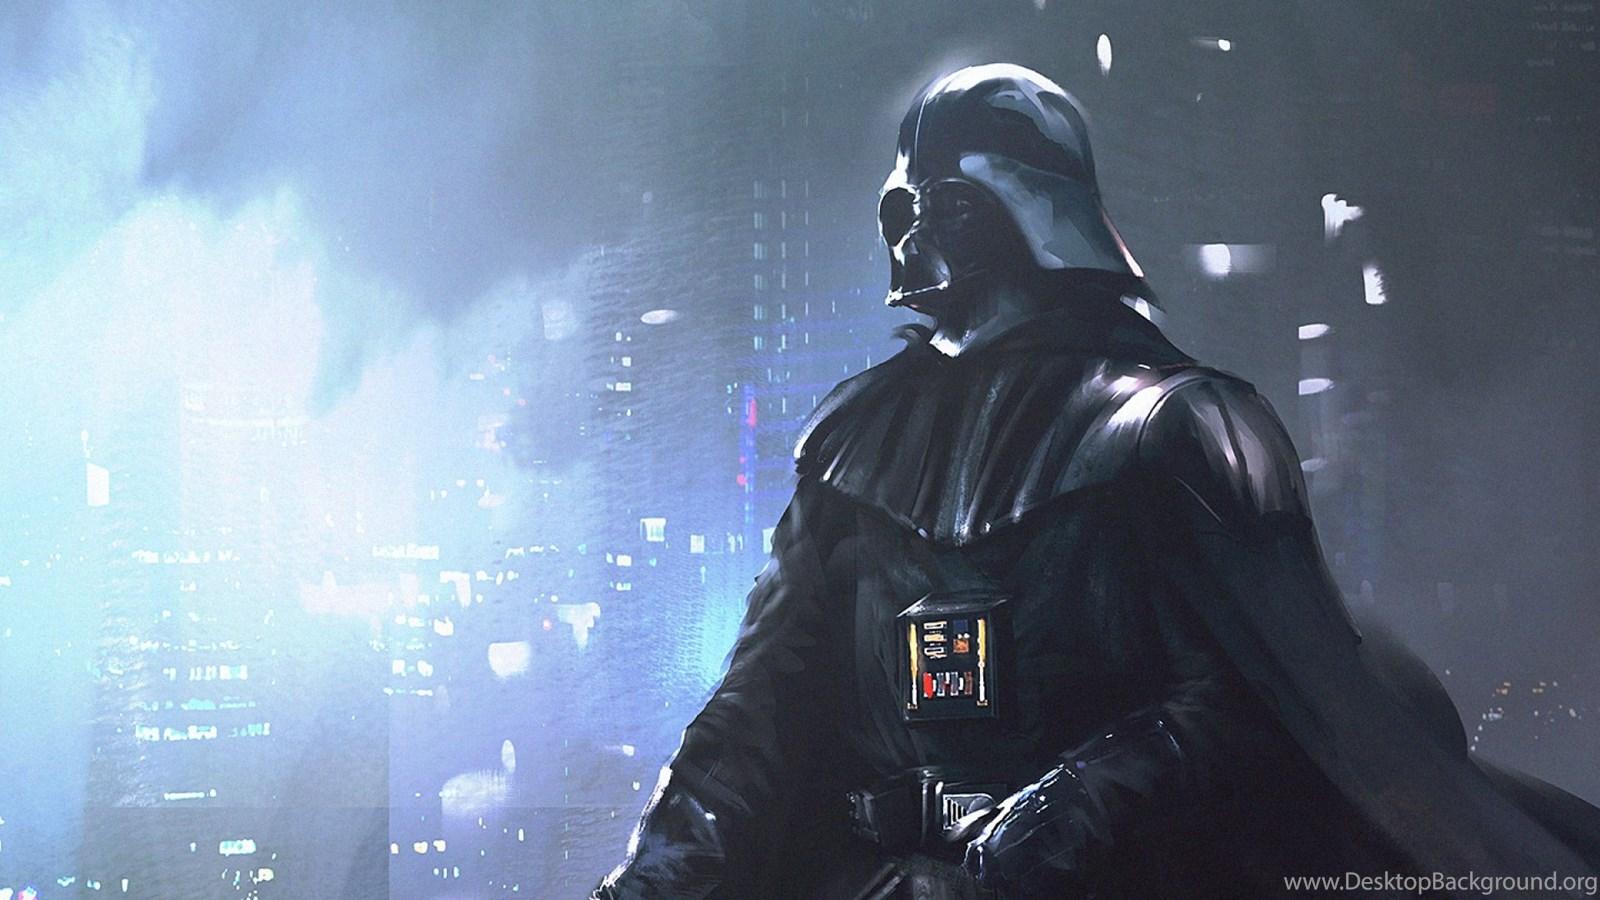 2560x1080 21 9 Tv Star Wars Wallpapers Hd Desktop Backgrounds Desktop Background